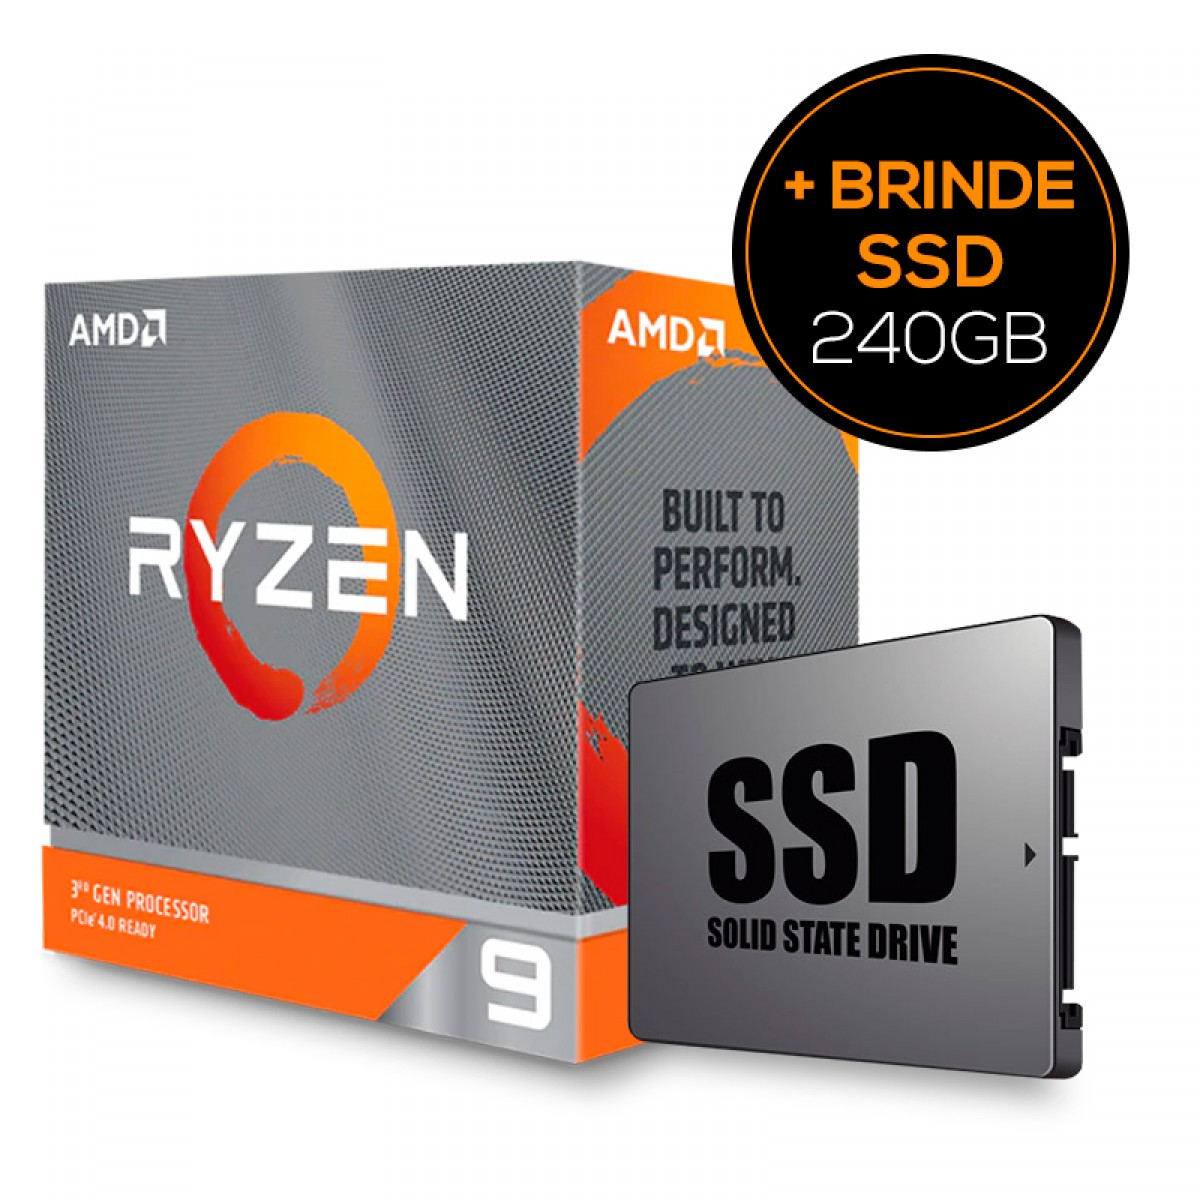 Processador AMD Ryzen 9 3900XT 3.8ghz + Grátis SSD 240GB